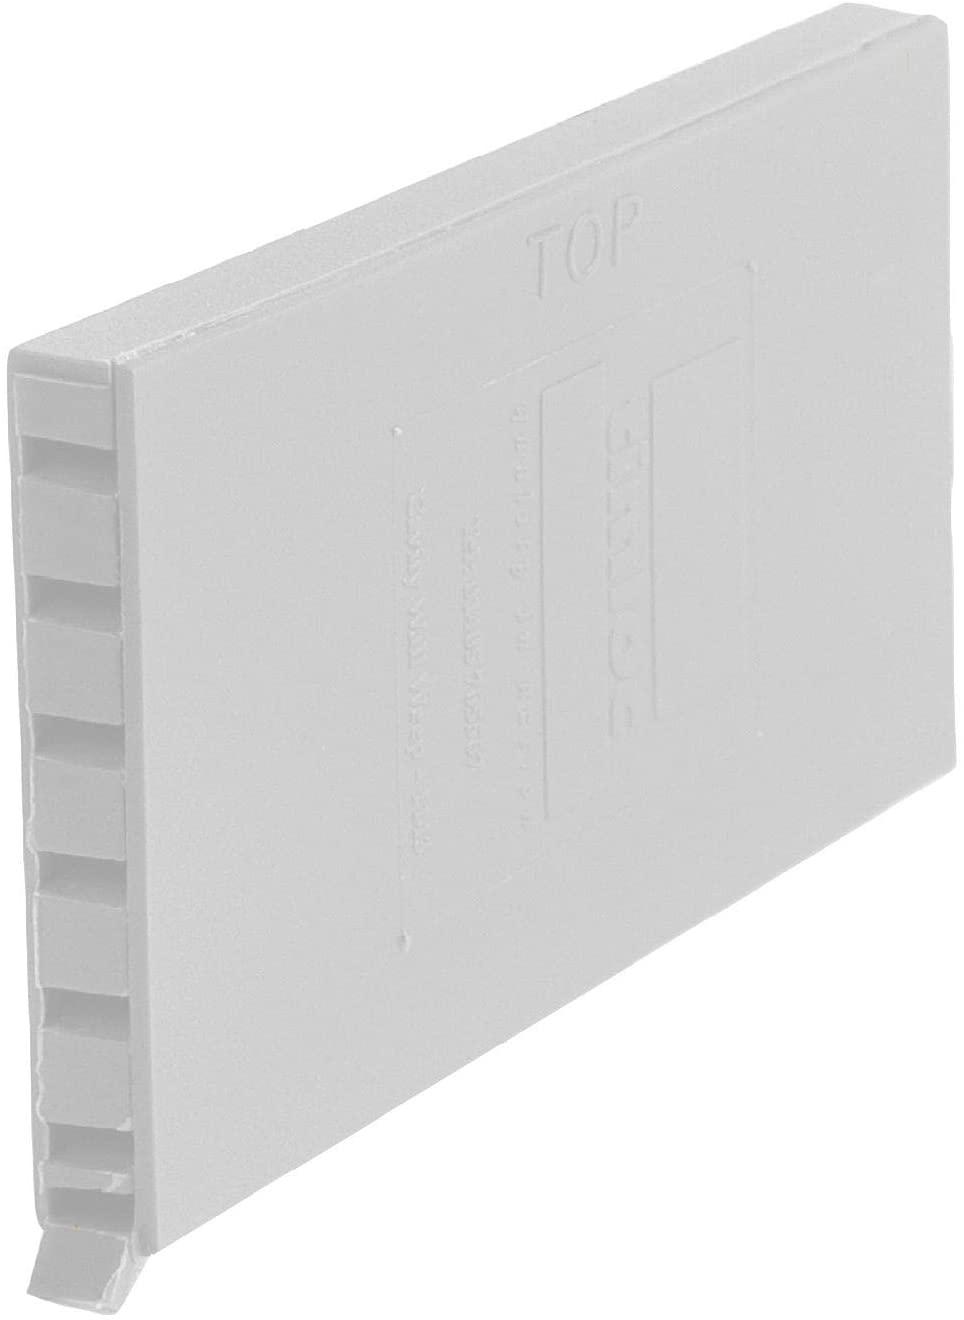 50 x White Brick Weep Vents Ventilation / Cavity Wall Retaining Garden Walls